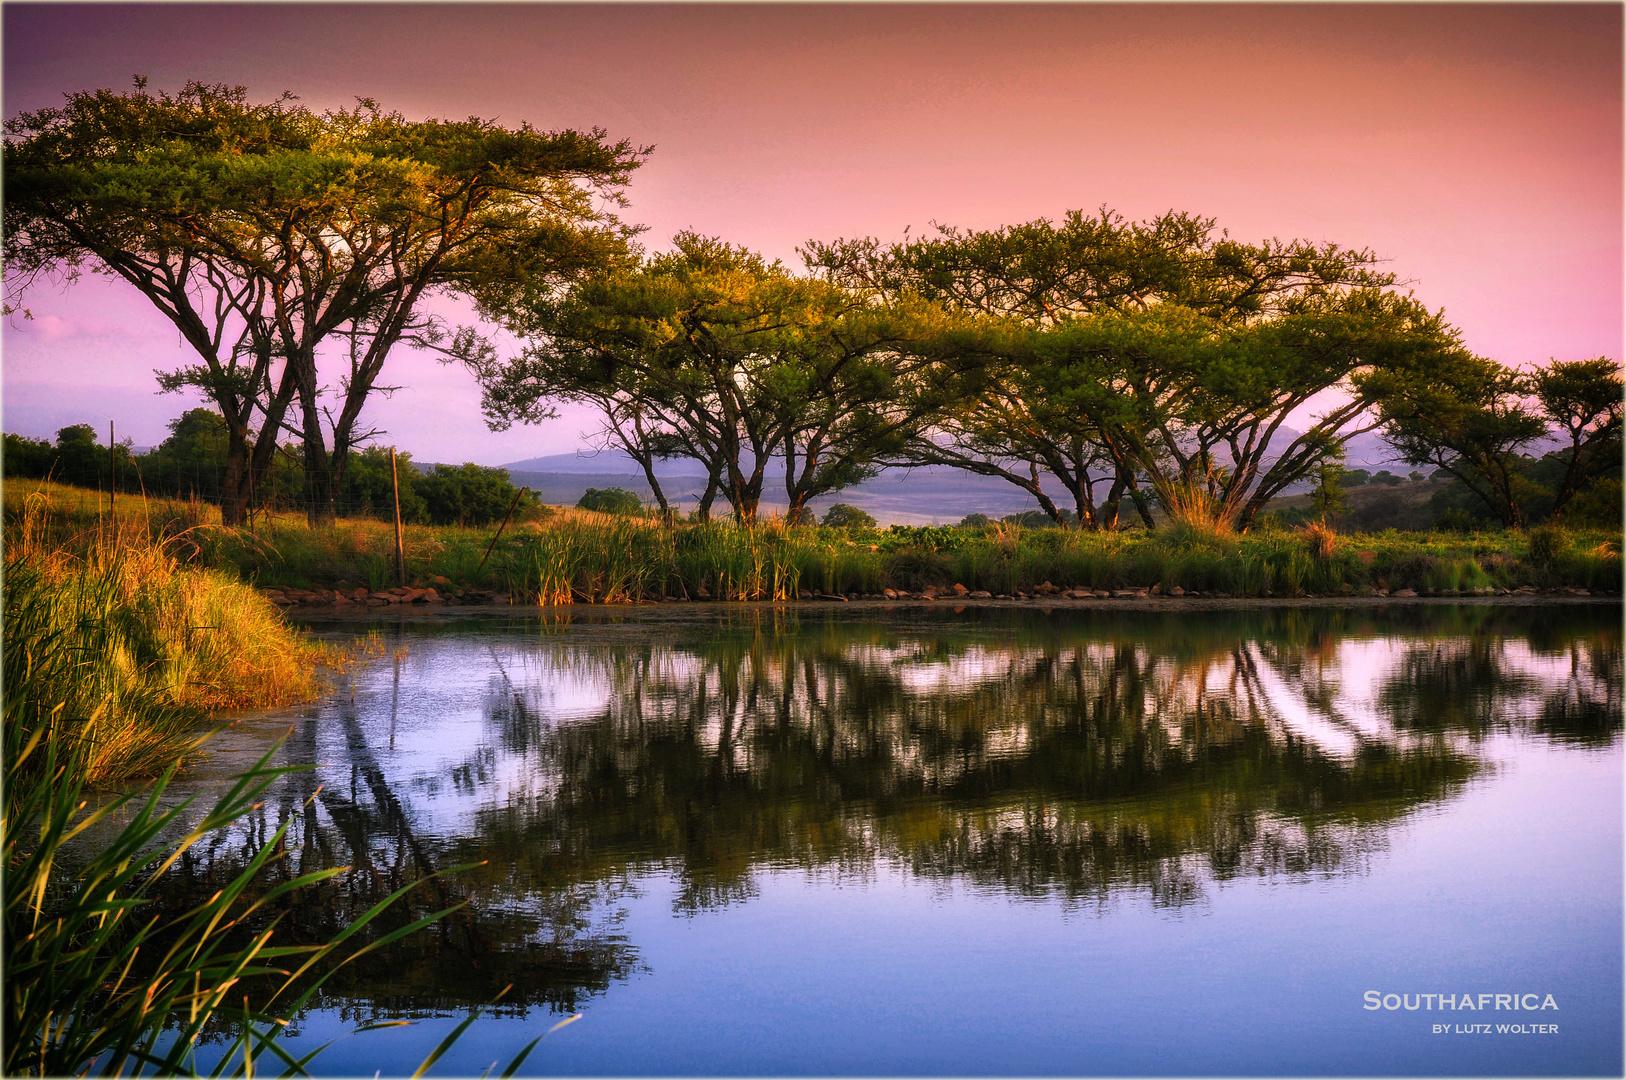 Southafrica - by Wagendrift Safaris